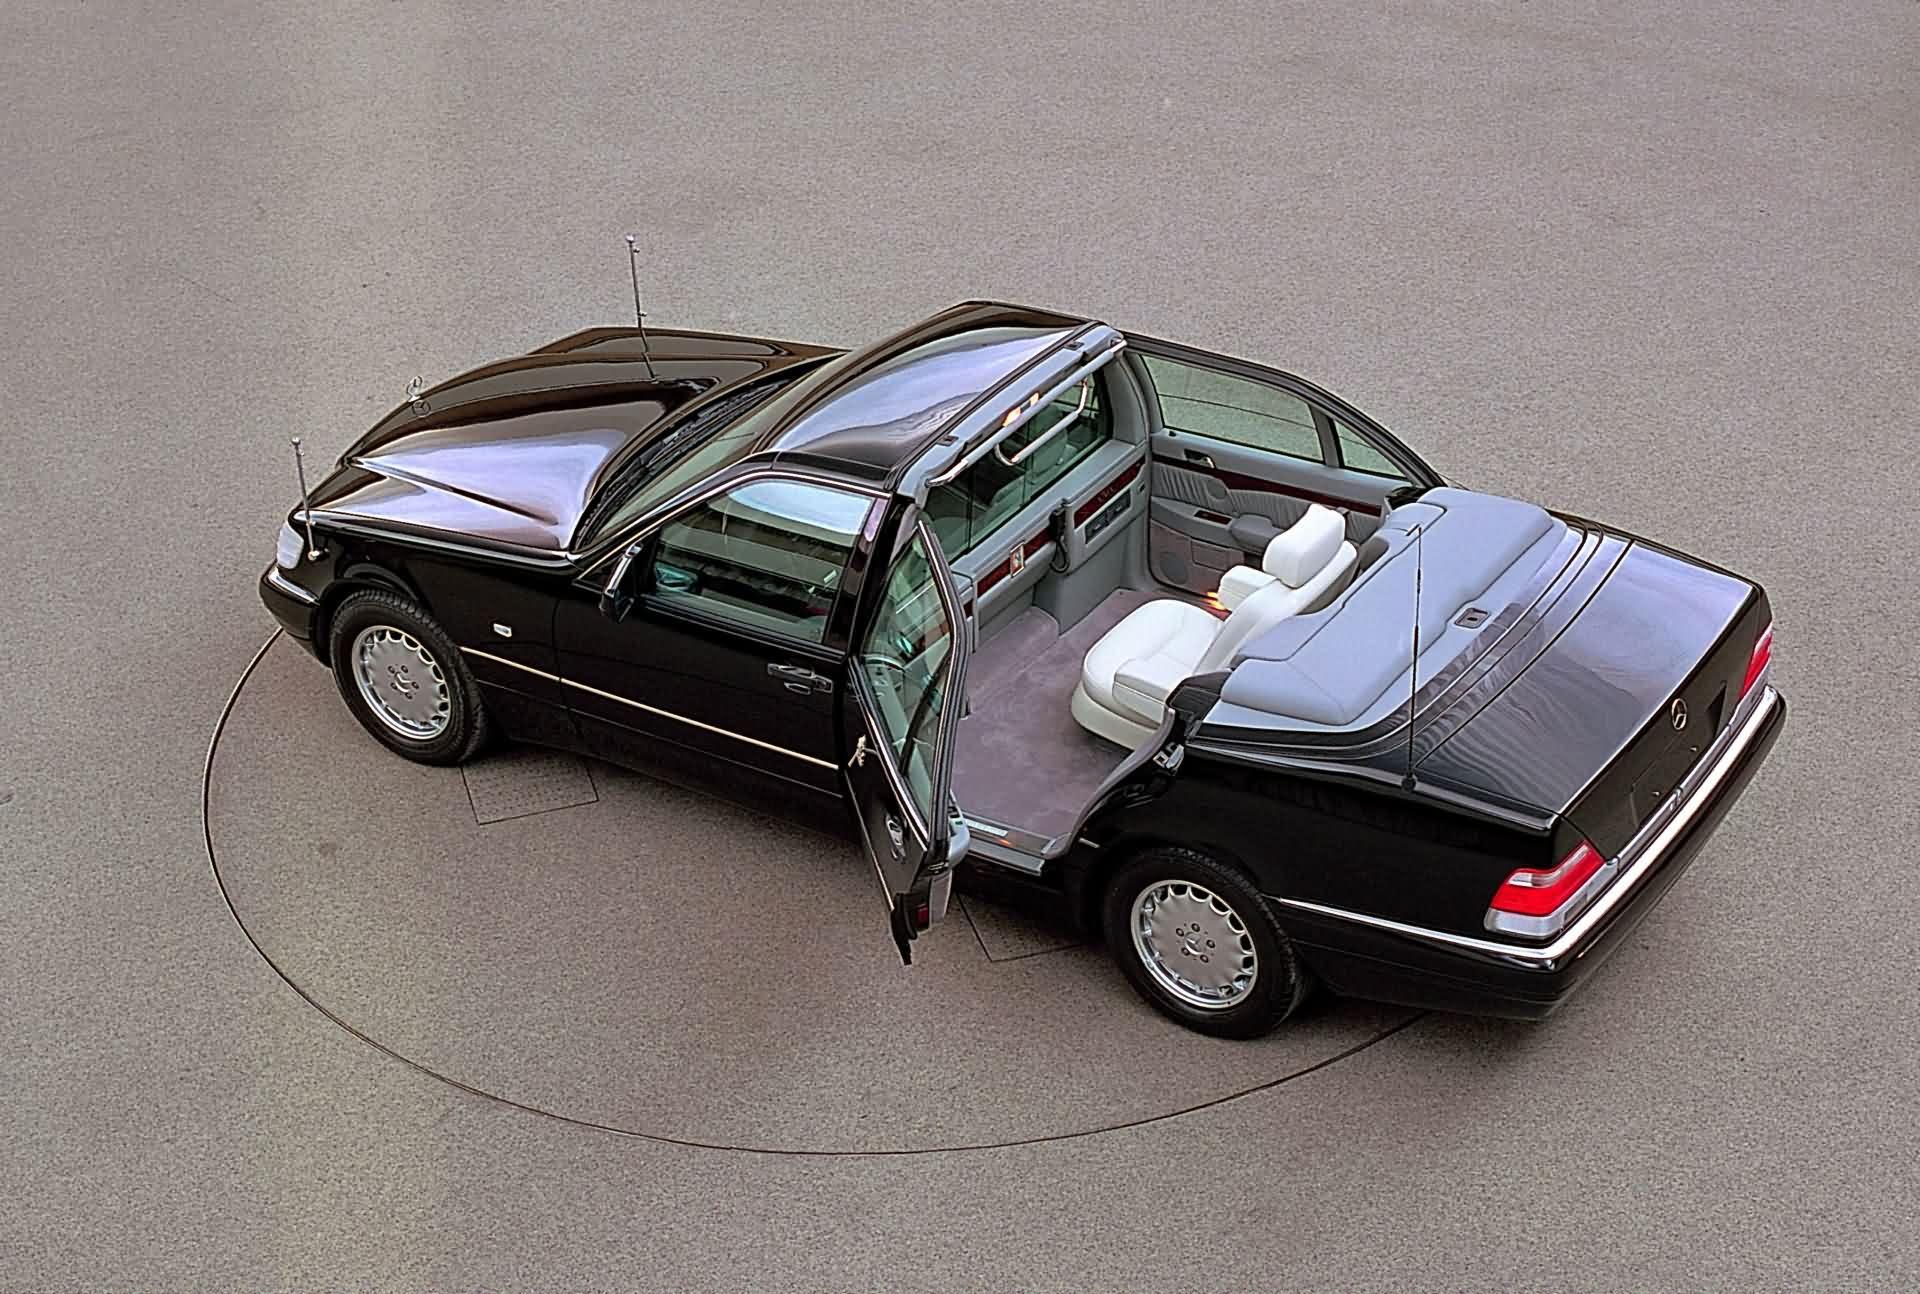 Mercedes-Benz S-Klasse Landaulet